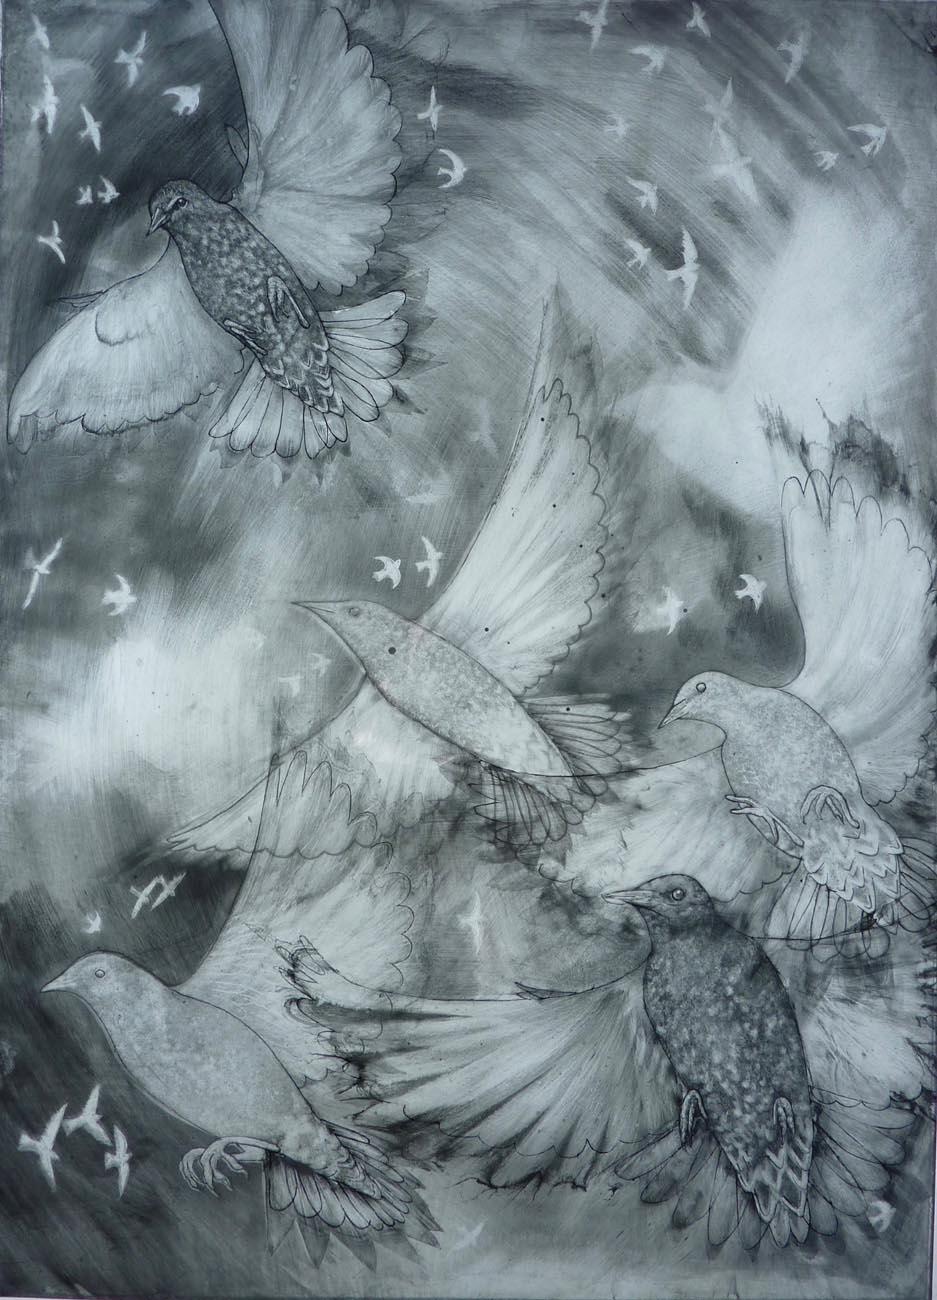 Starlingstainedglass